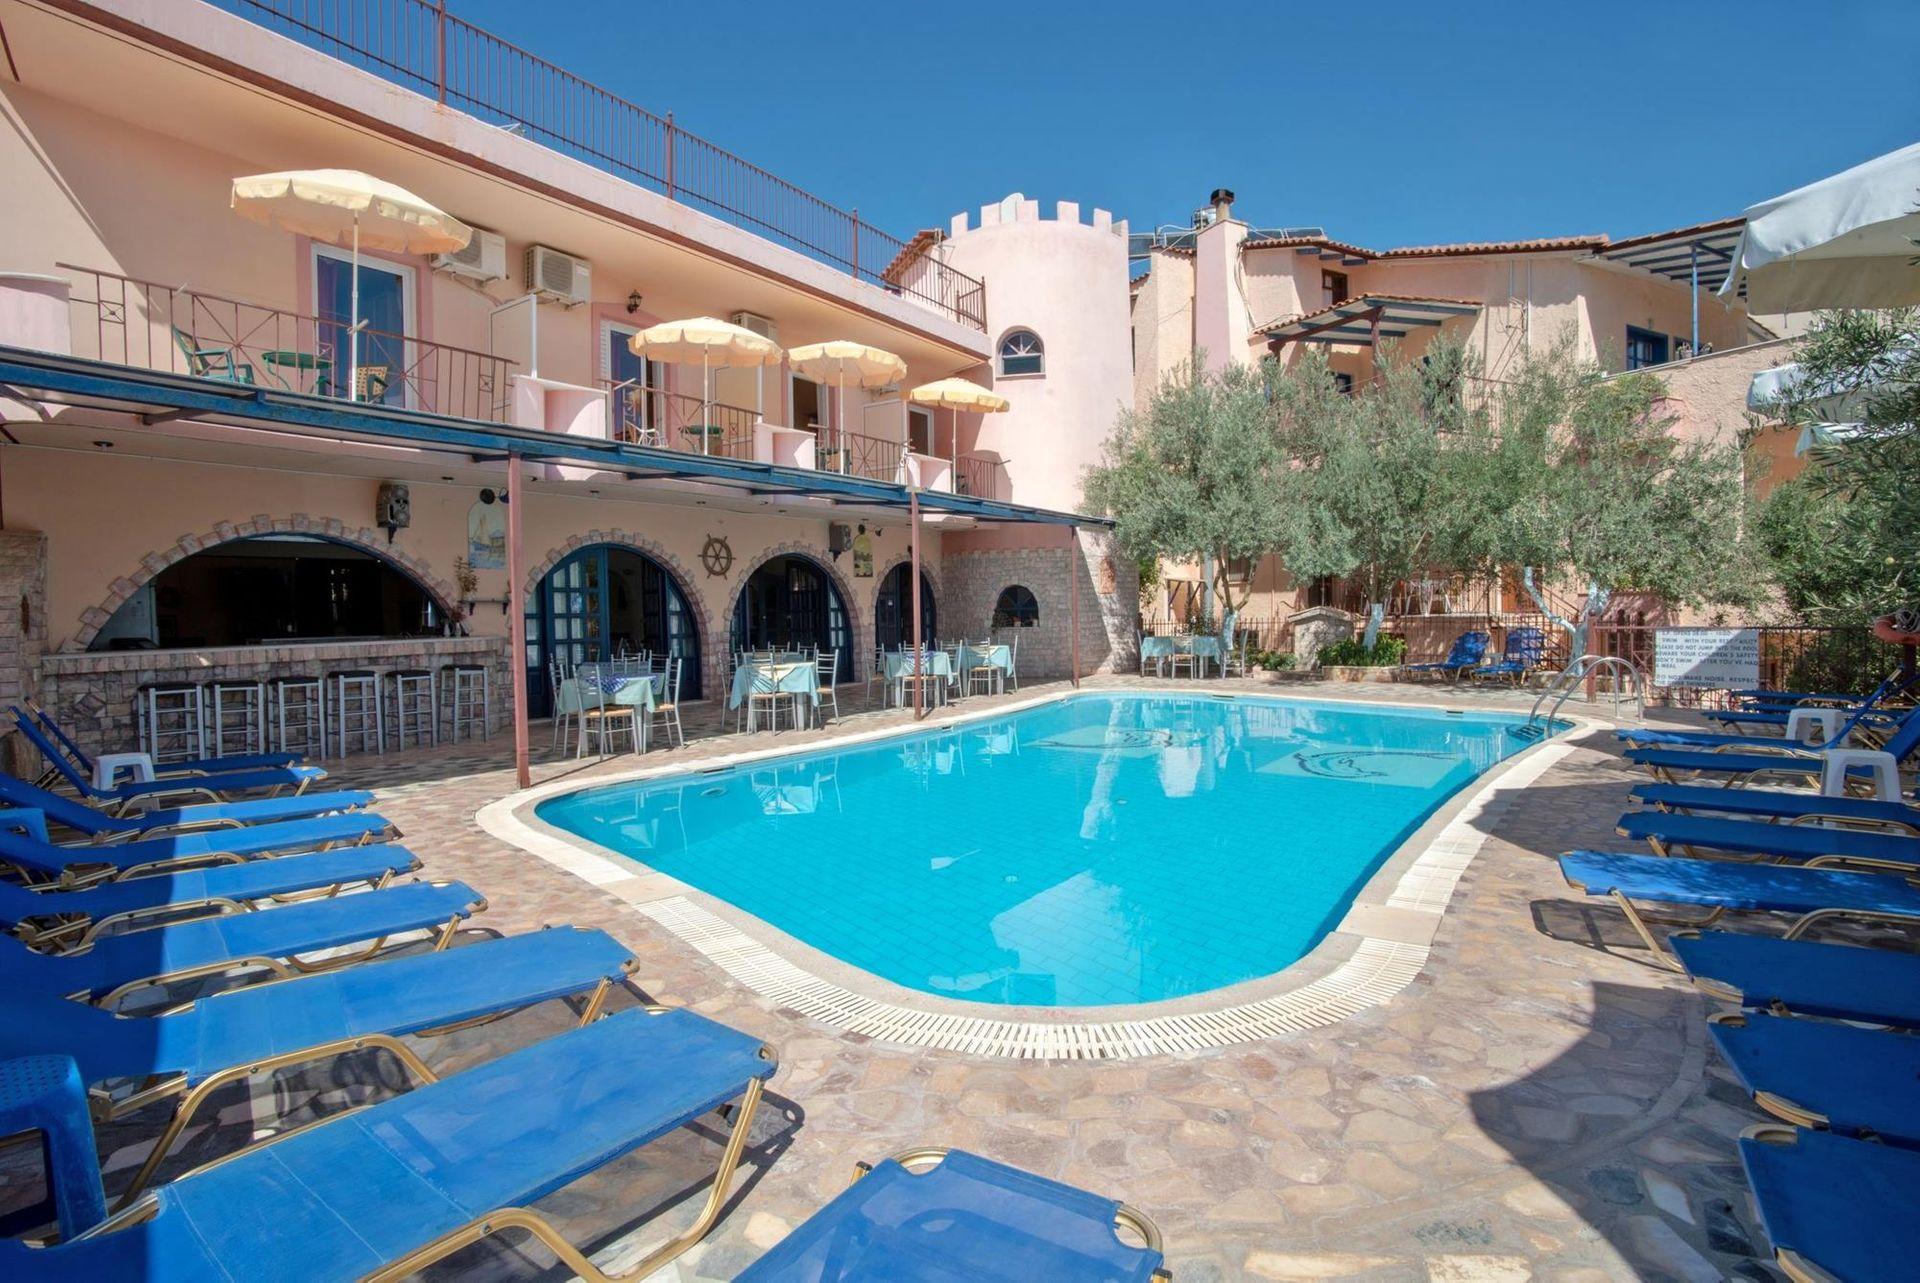 Kleoni Hotel & Apartments Tolo - Τολό ✦ -8% ✦ 6